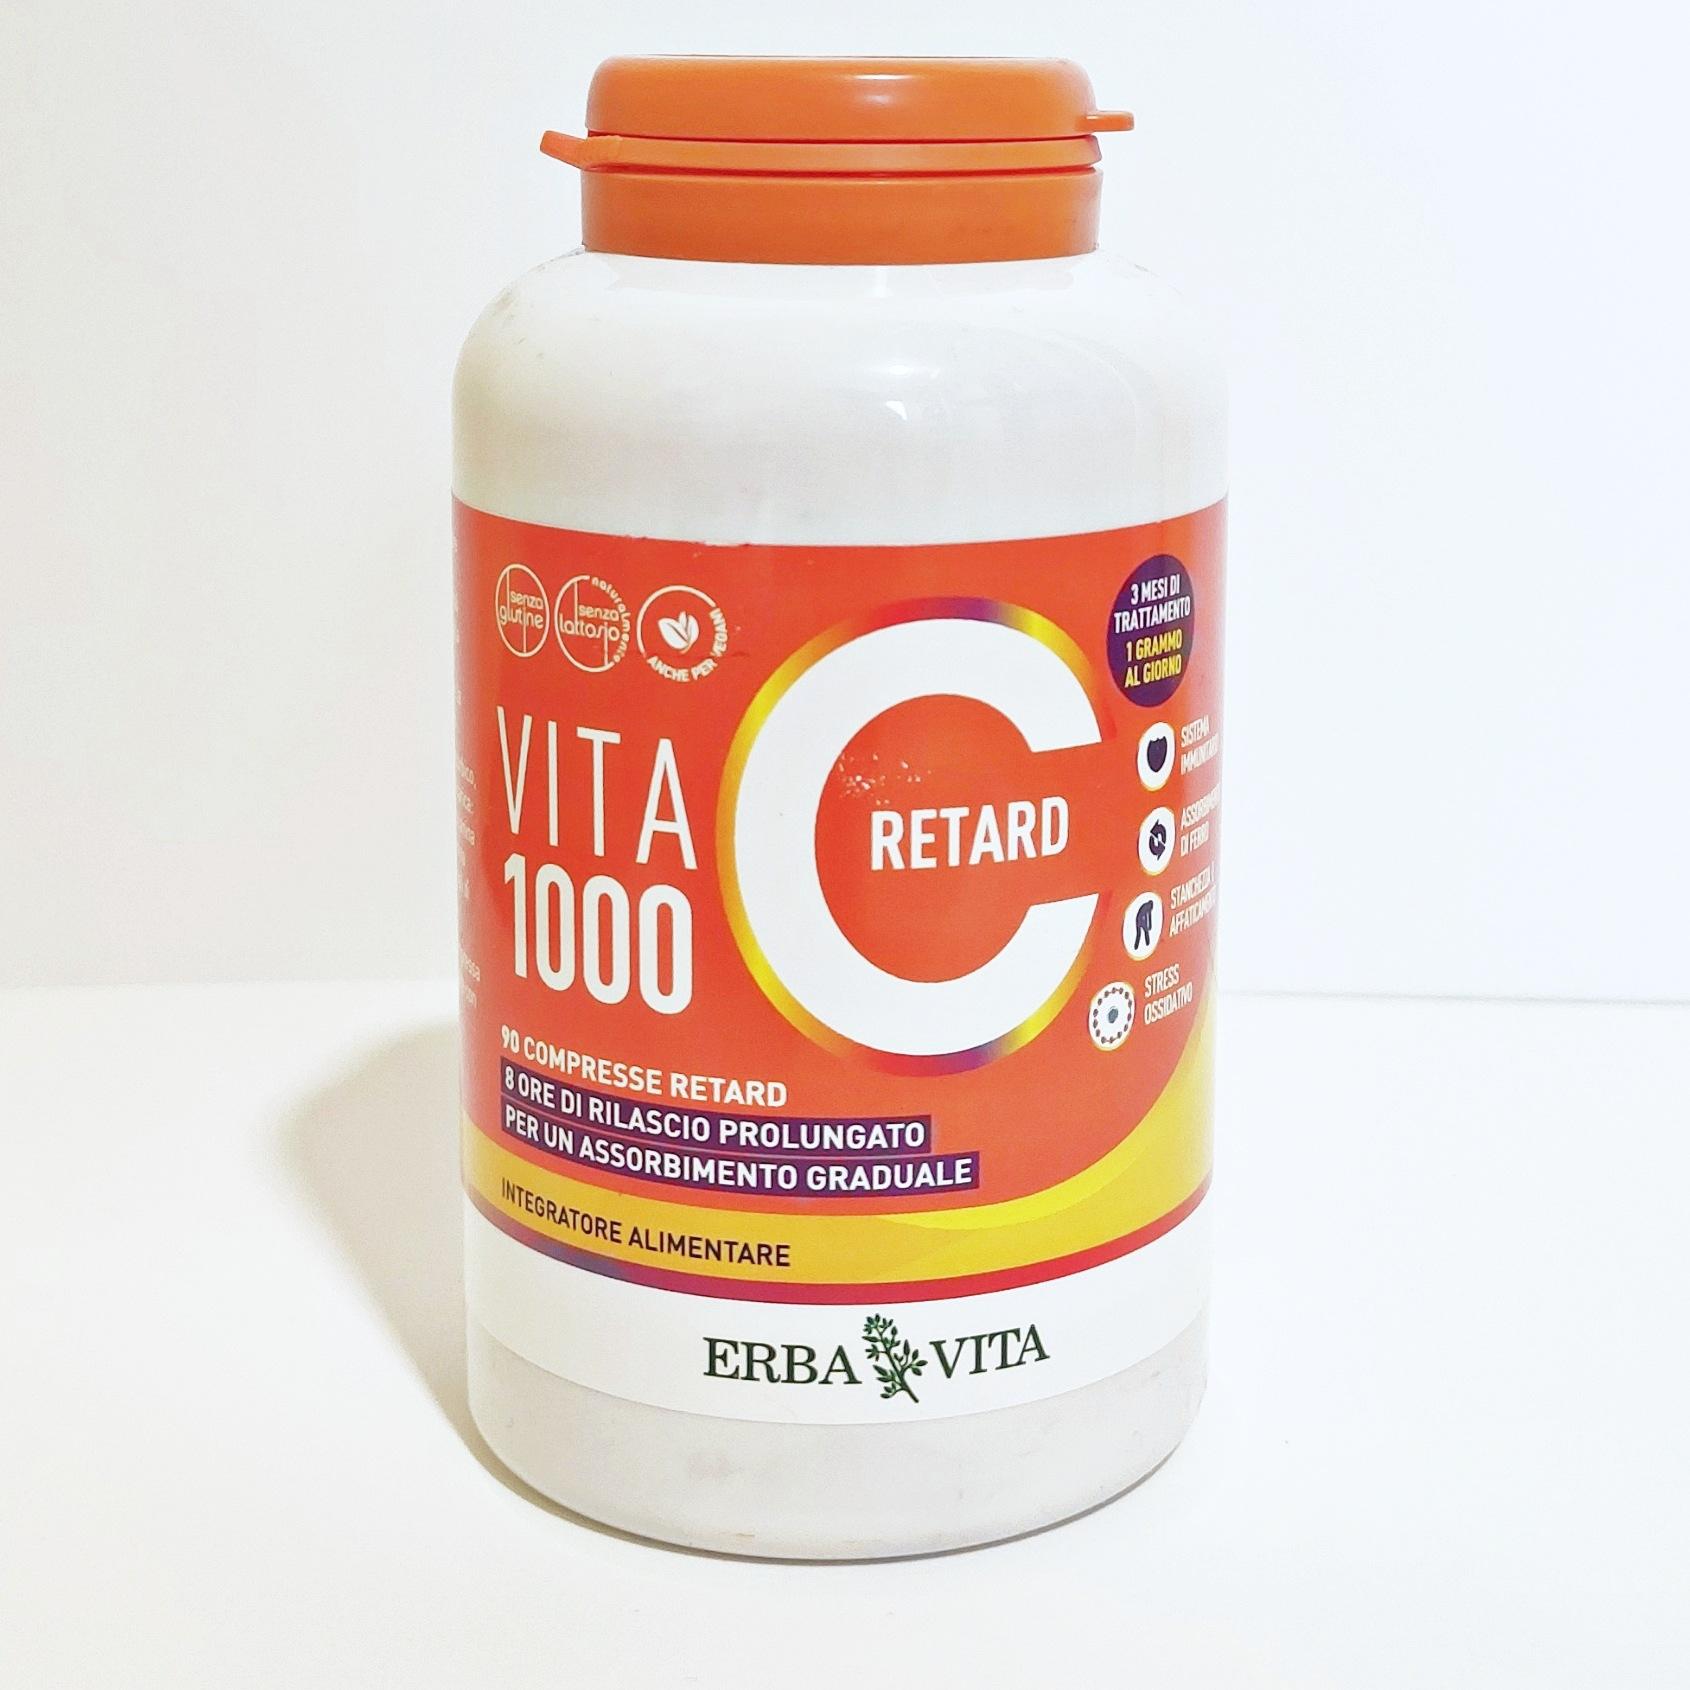 VITA C 1000 RETARD Pilloliera 90 compresse retard